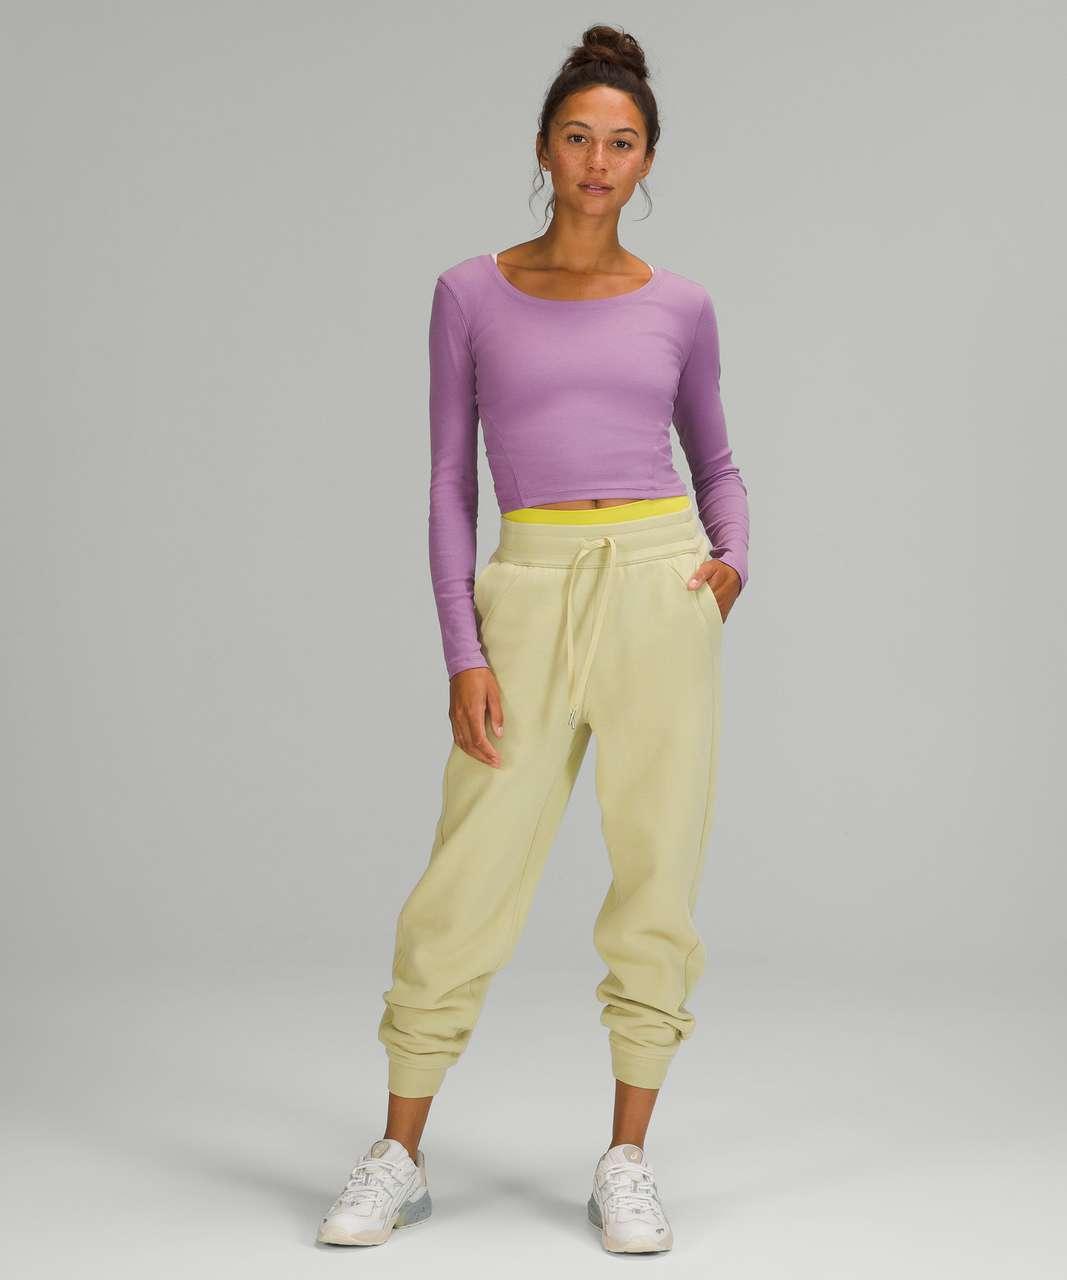 Lululemon Open Back Ribbed Long Sleeve Shirt - Wisteria Purple